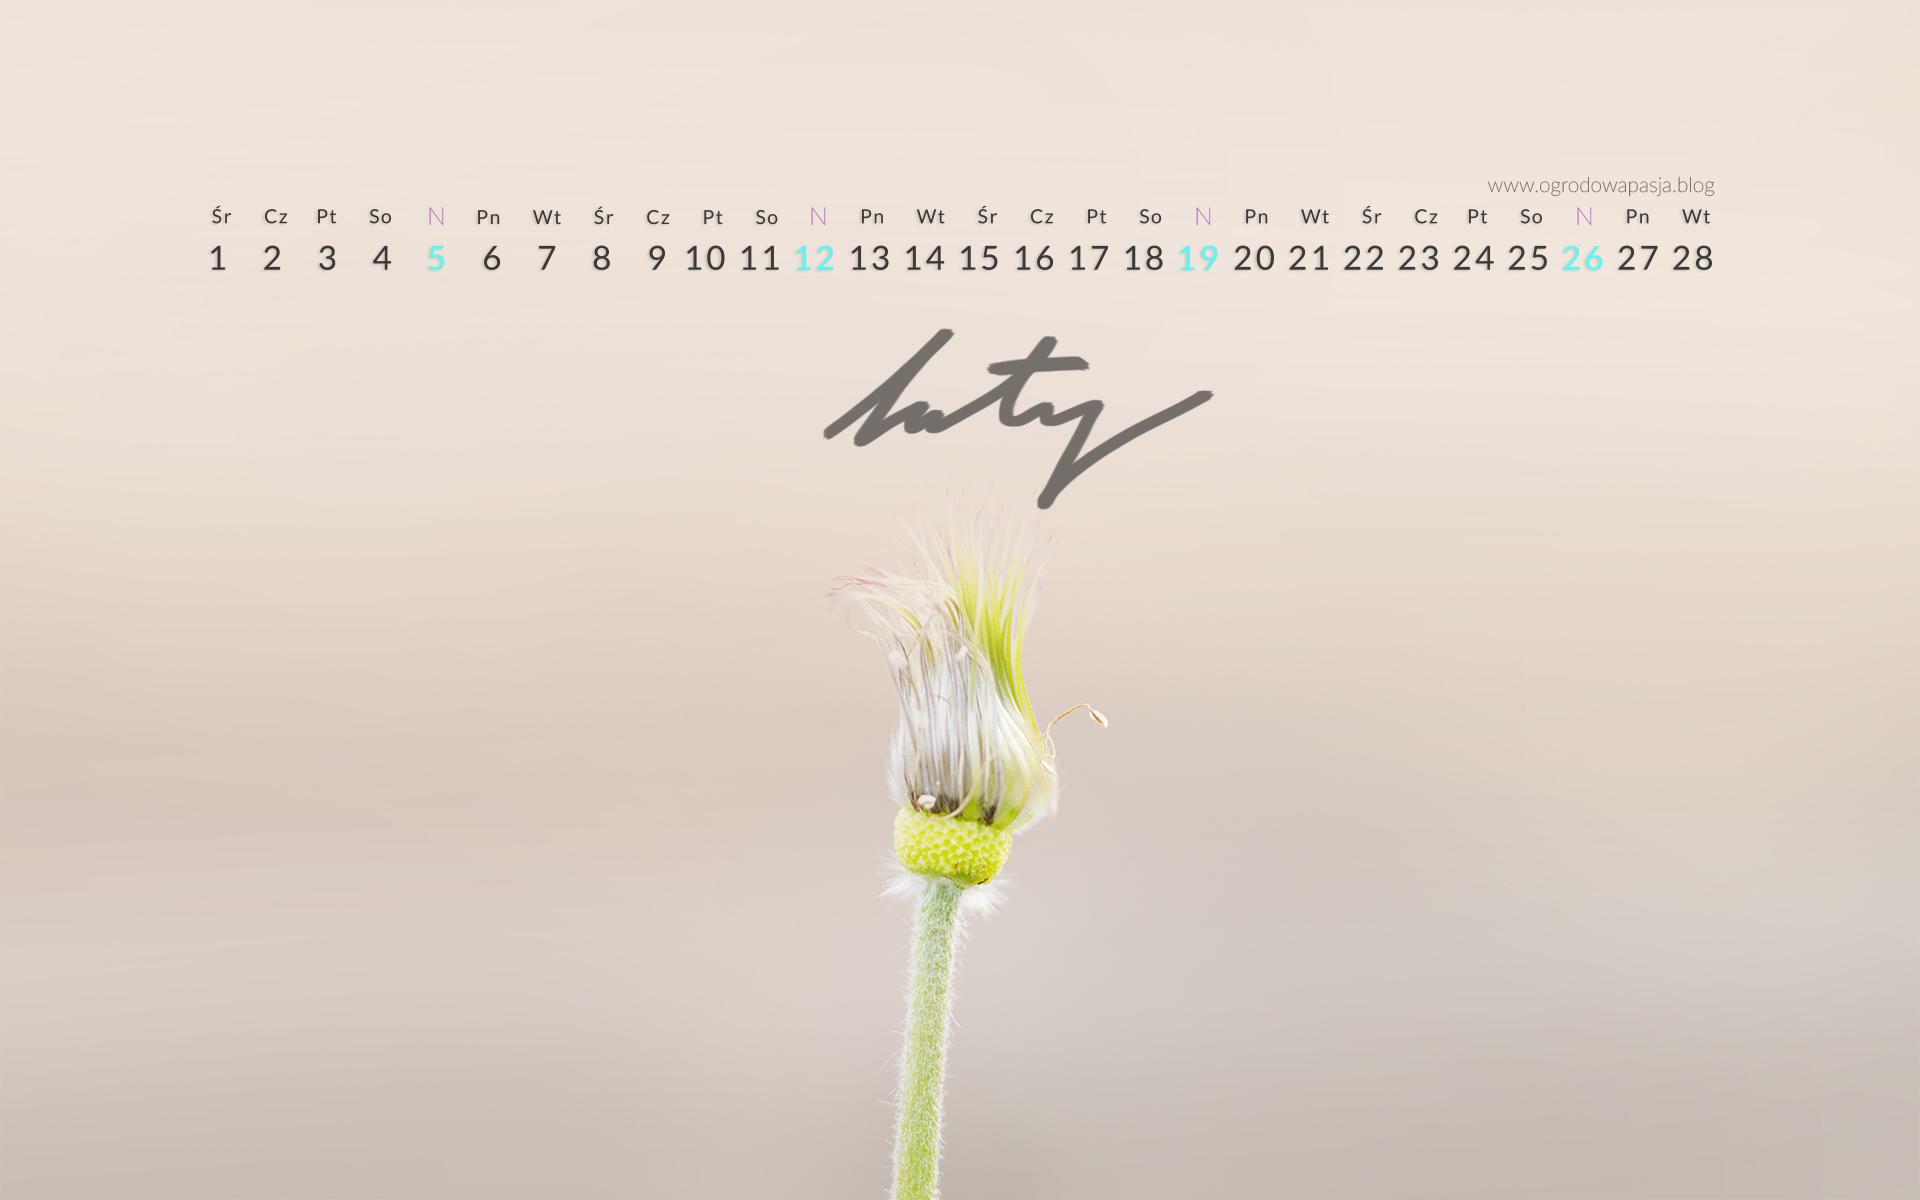 kalendarz na pulpit 2017 luty